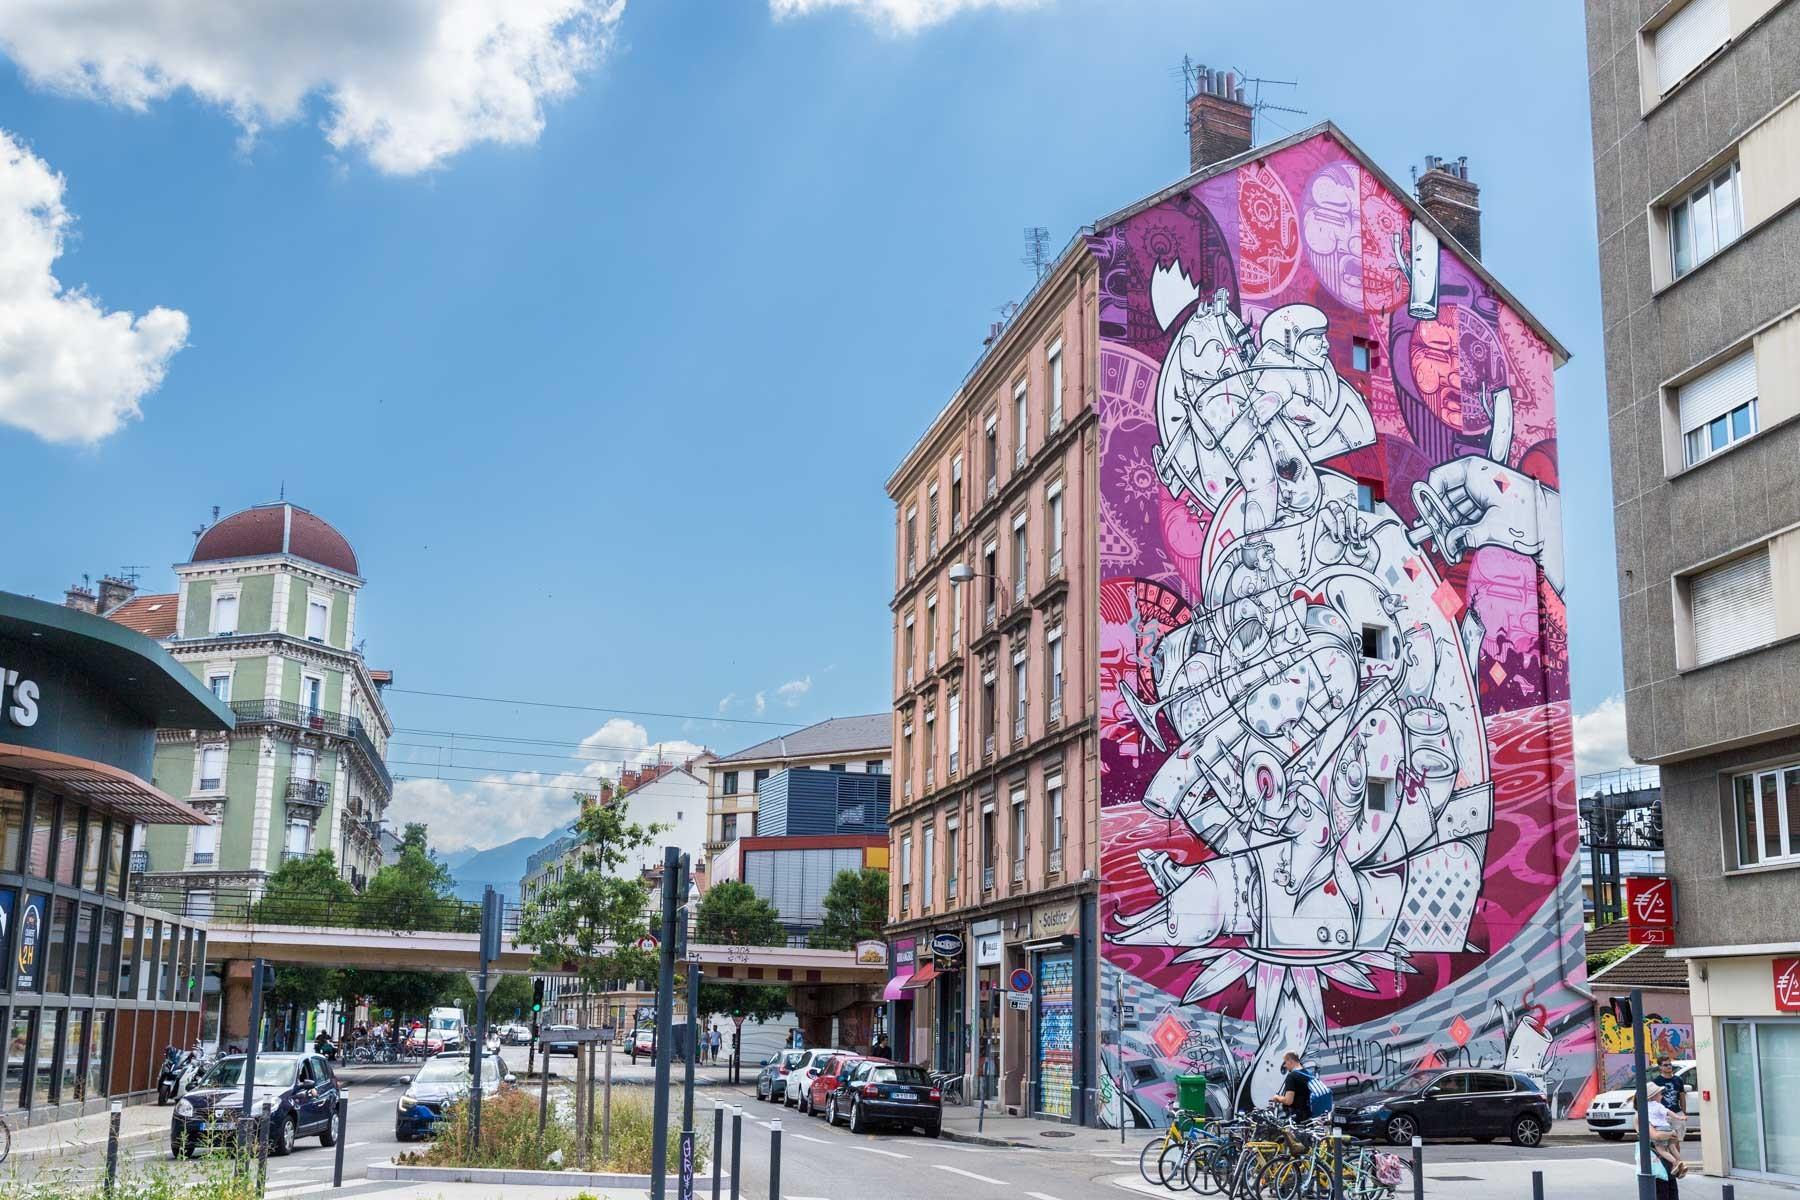 Hownosm - Grenoble - Juillet 2019